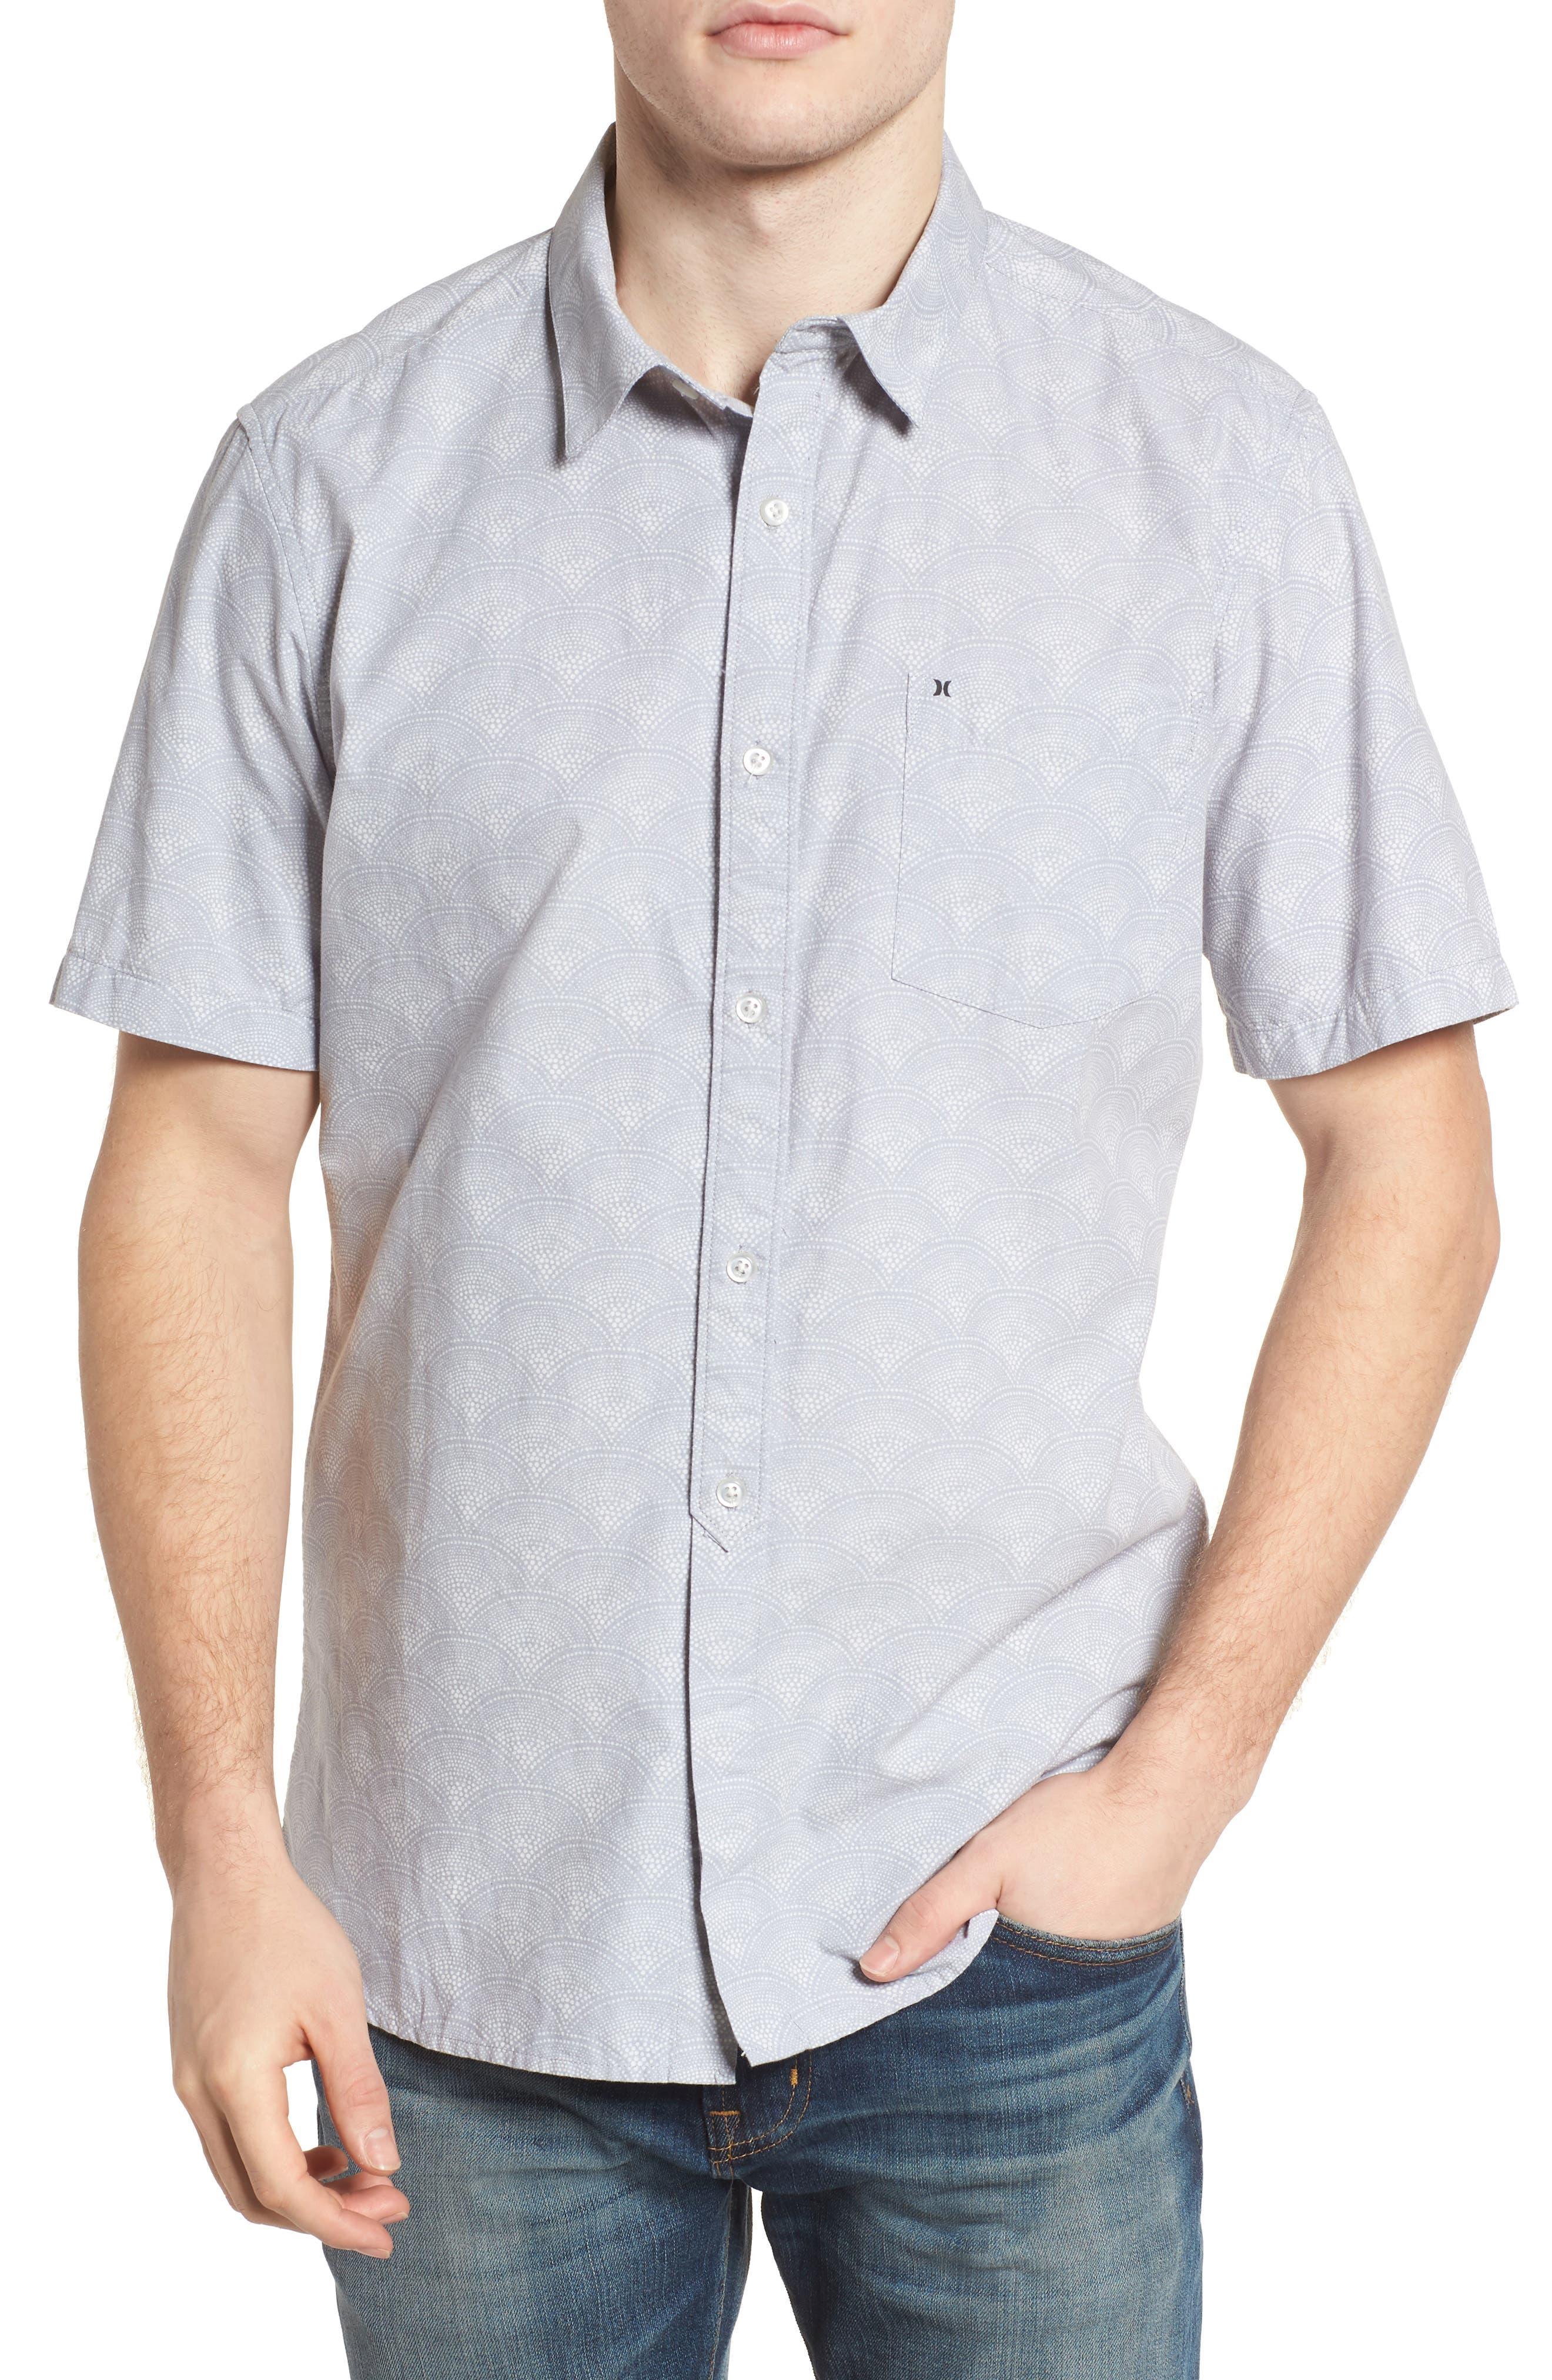 Pescado Short Sleeve Oxford Shirt,                             Main thumbnail 1, color,                             LIGHT PUMICE